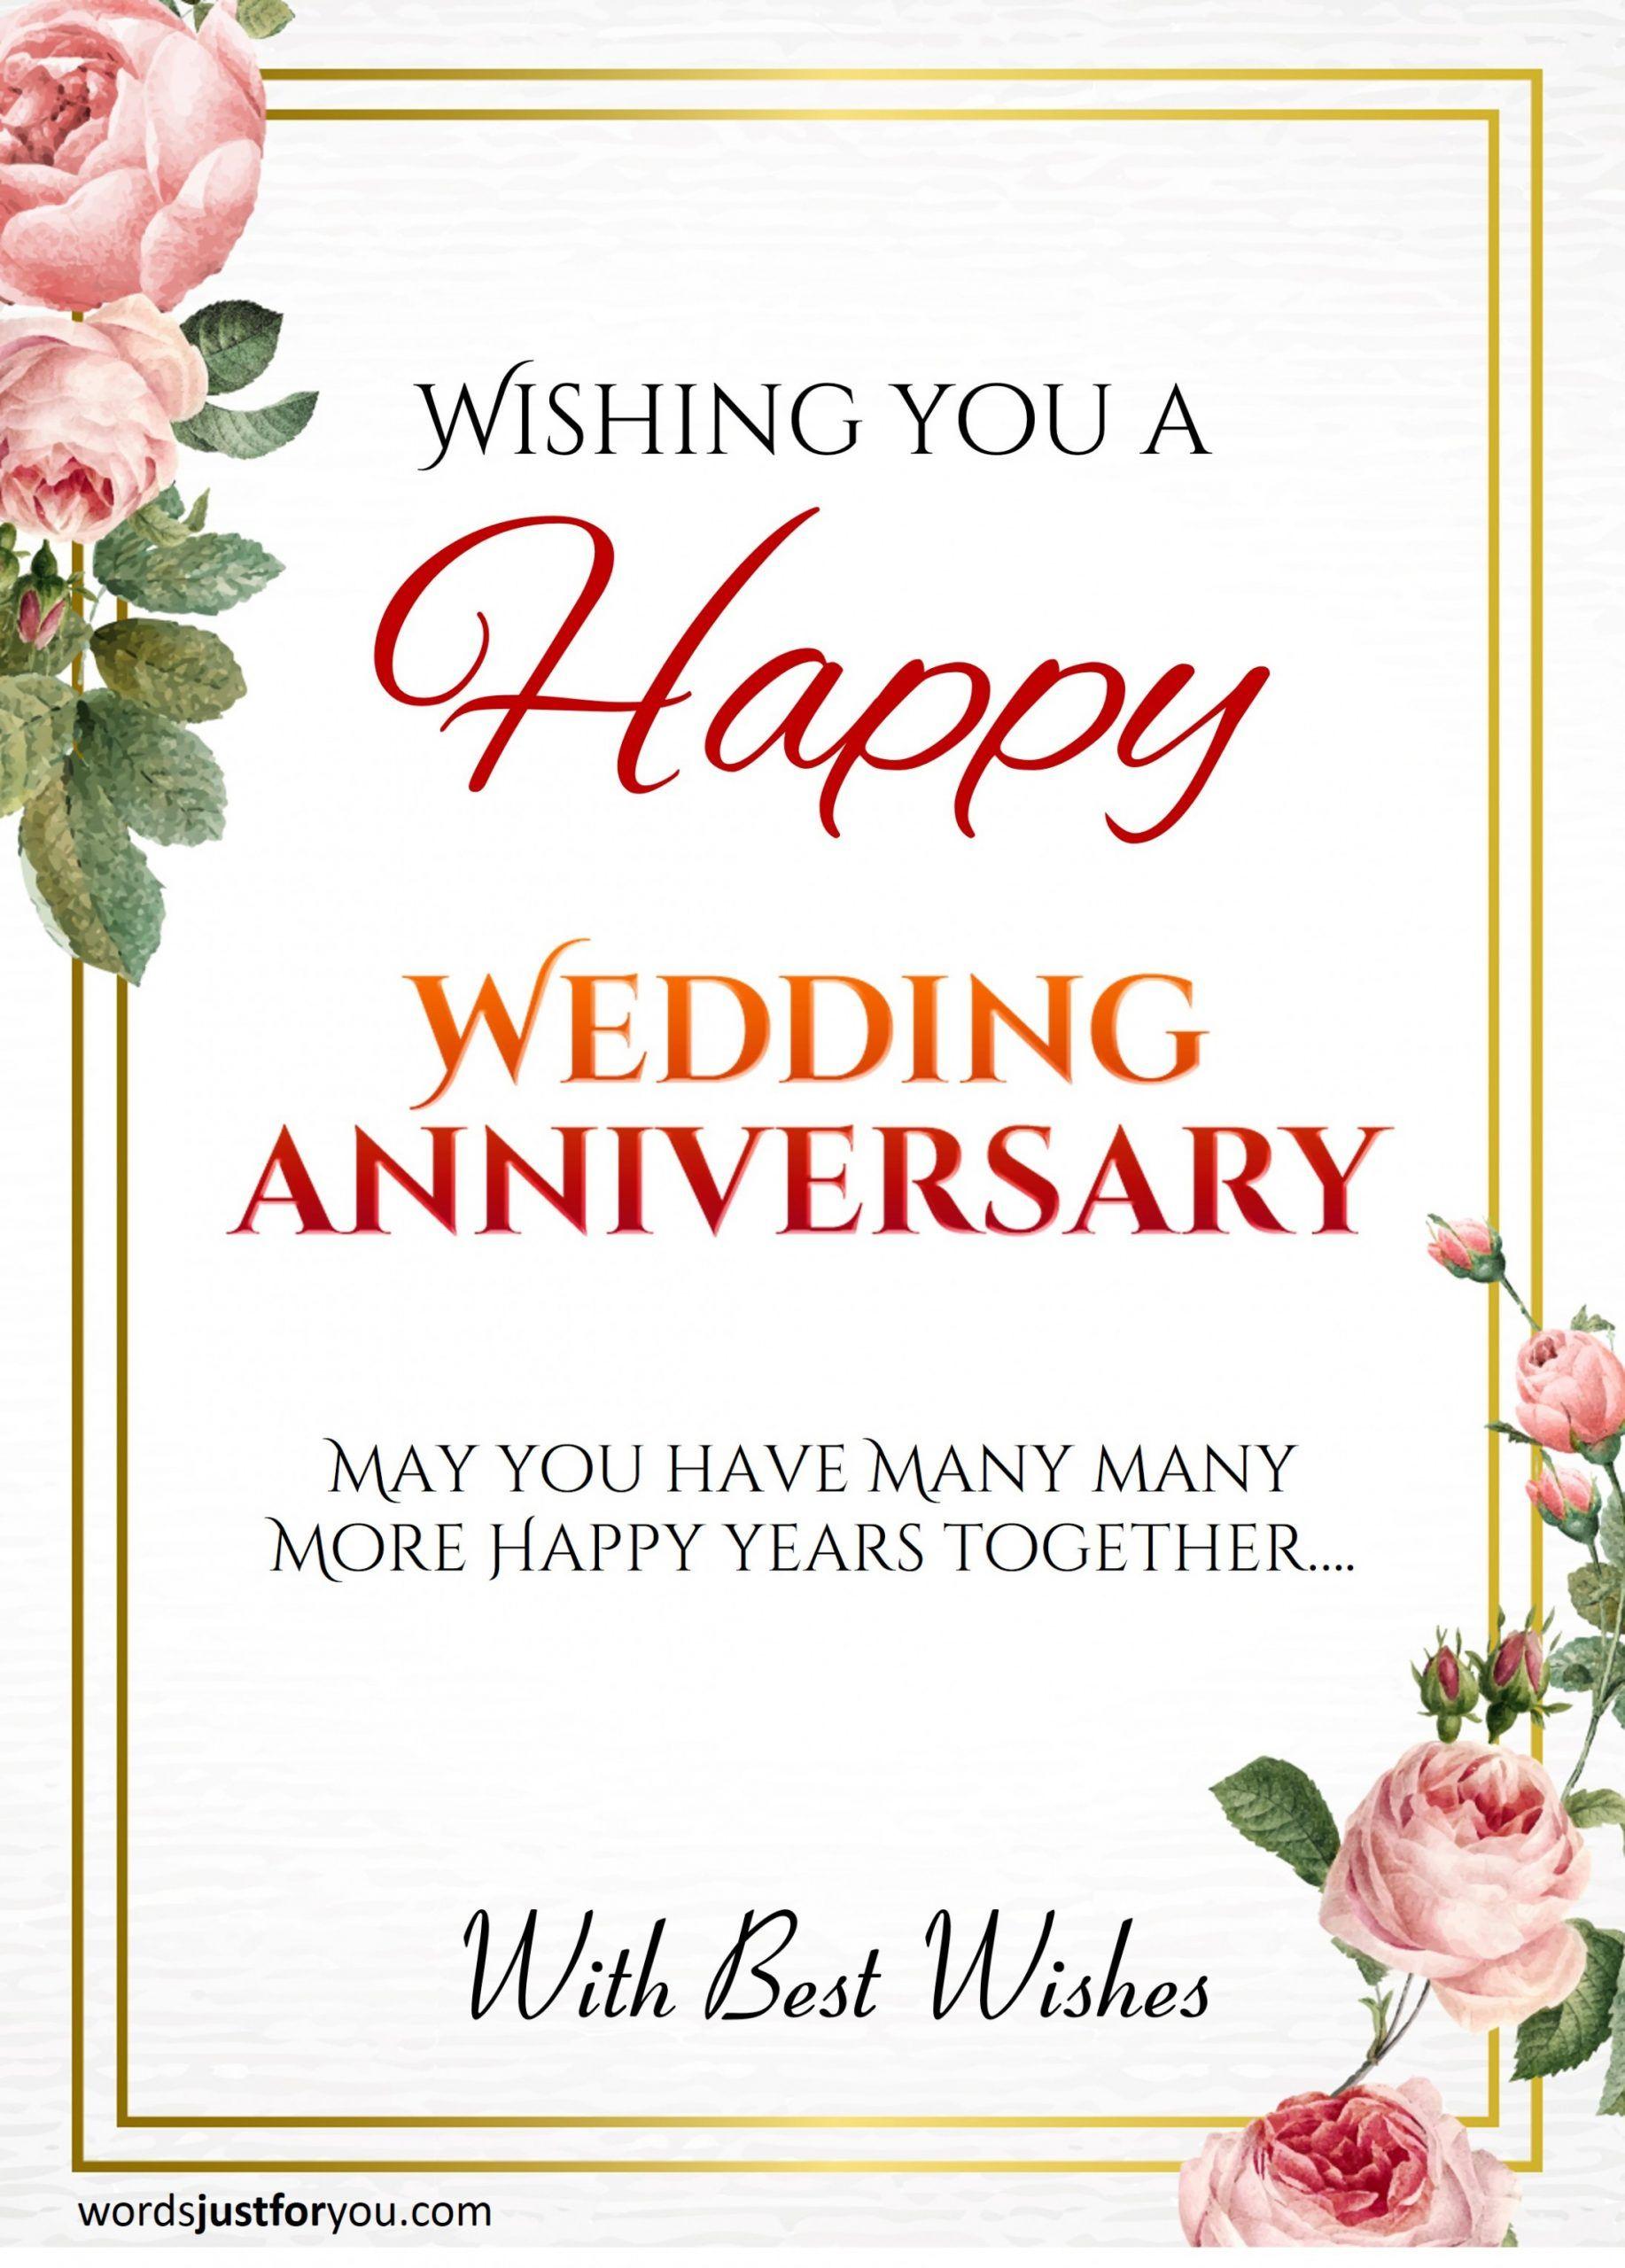 8 New Ideas Happy Wedding Anniversary Card Wedding Anniversary Cards Happy Wedding Anniversary Cards Happy Marriage Anniversary